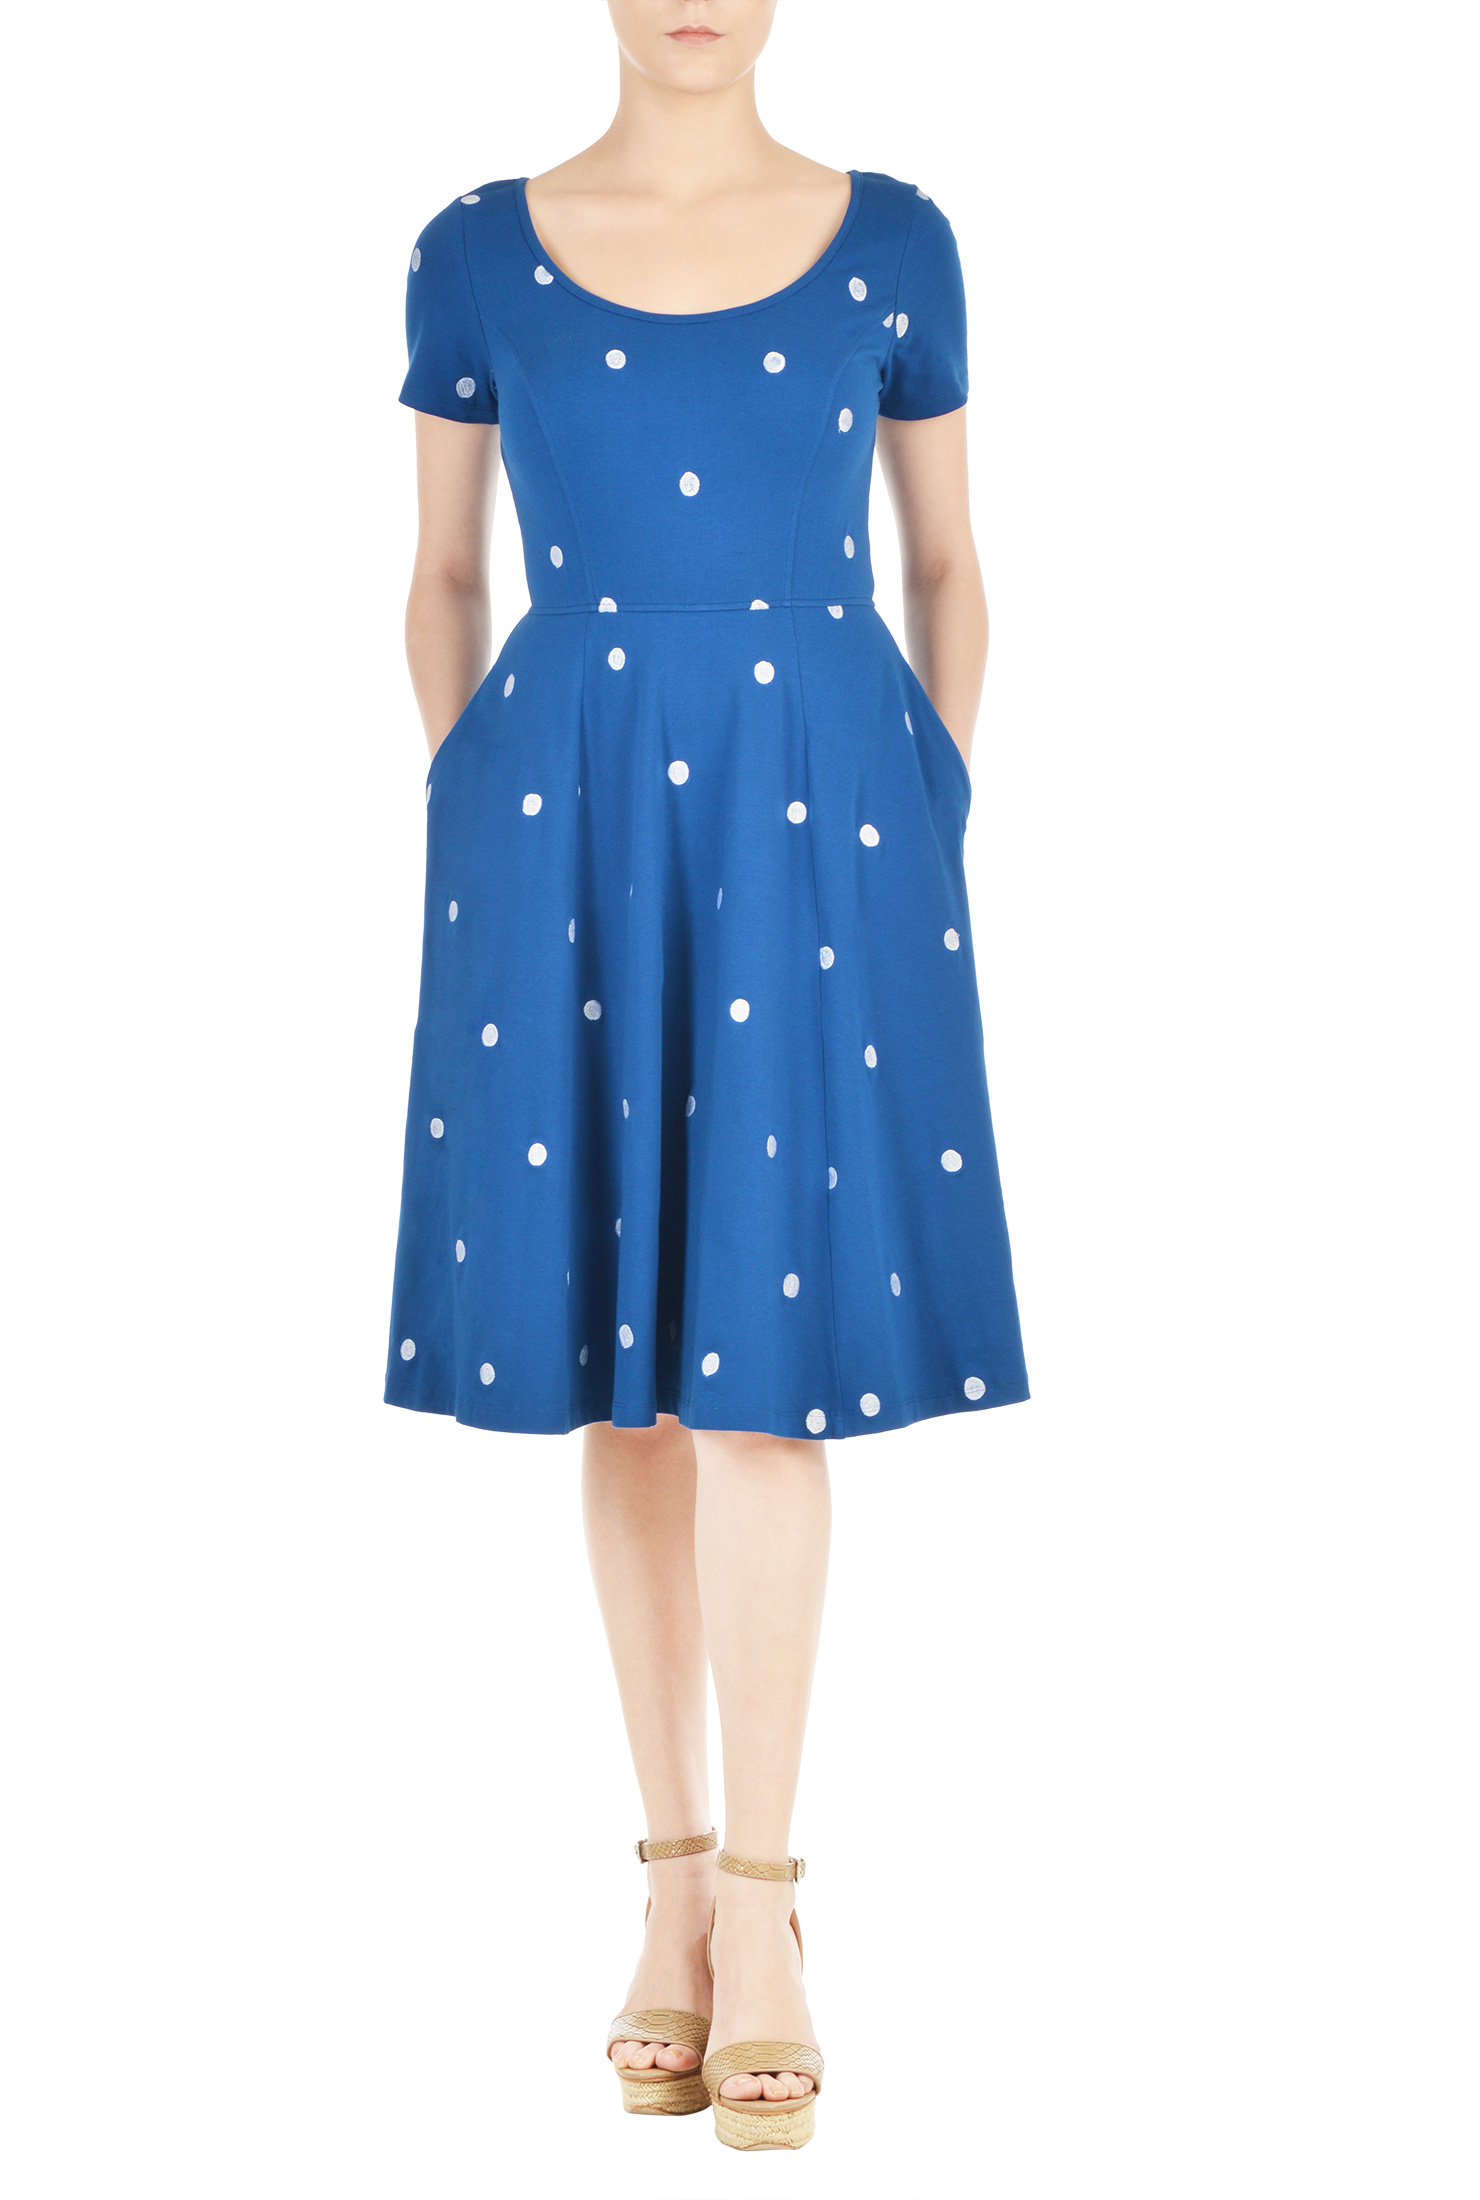 Eshakti Womens Polka Dot Embellished Cotton Knit Dress